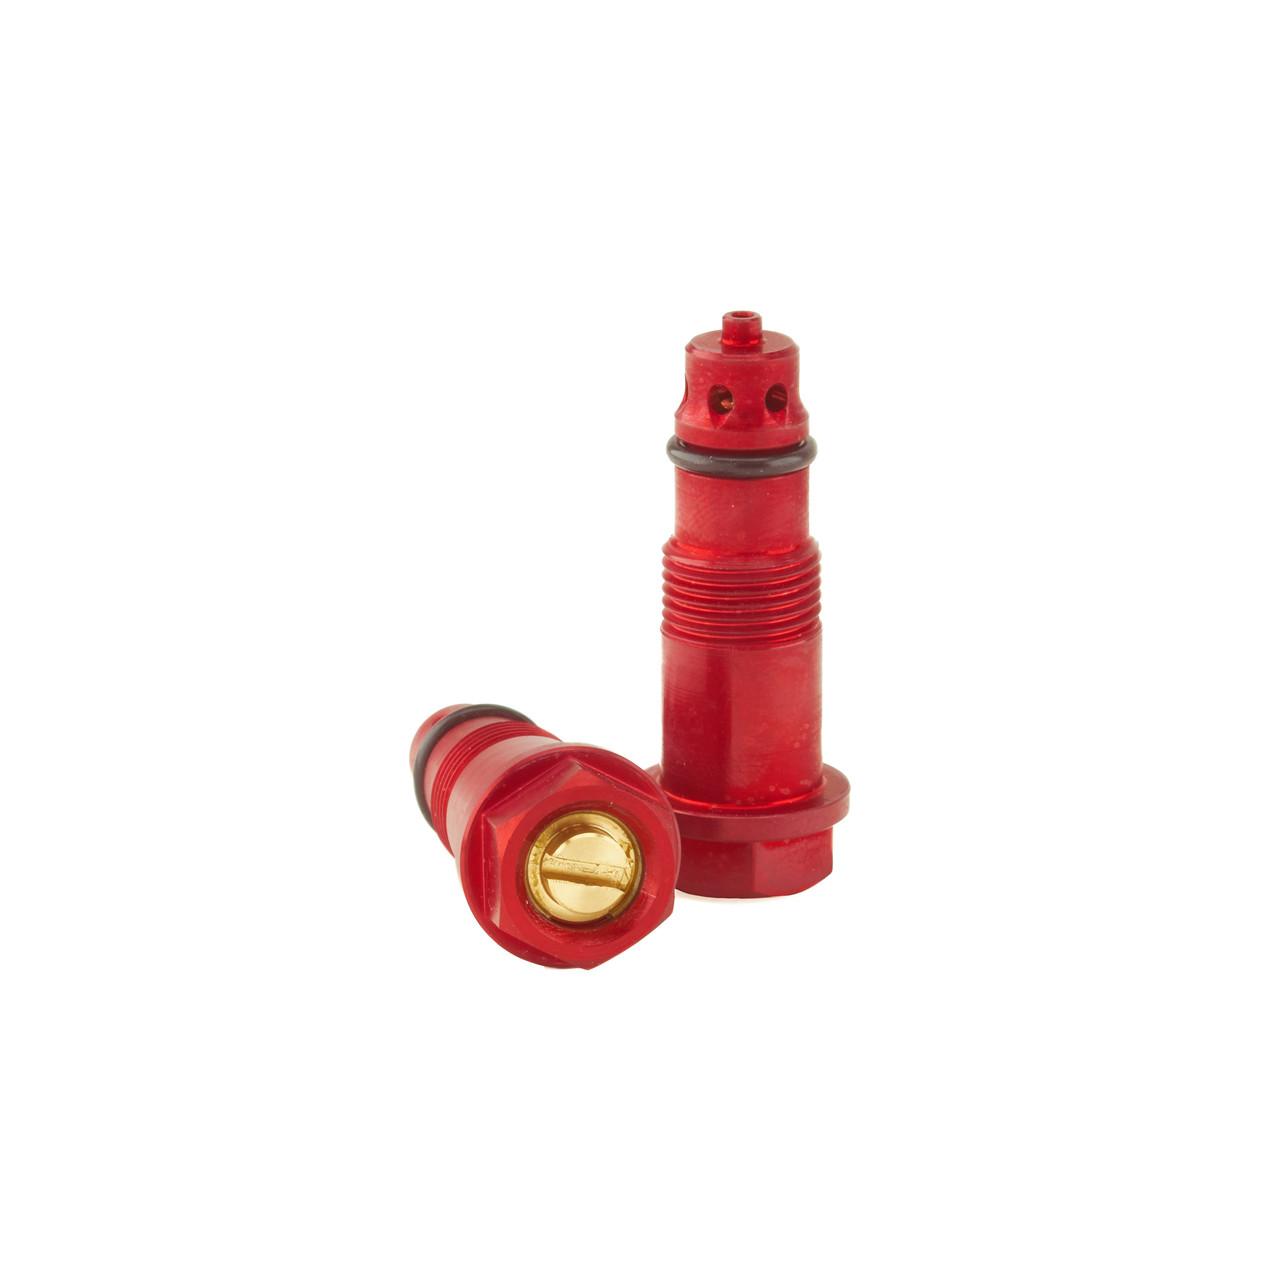 FF FCV KYB 2.0mm KAWA ZX-R 98-03 YAMAHA R1 98-03, R6 98-04 20K-FCV-KYB-1A